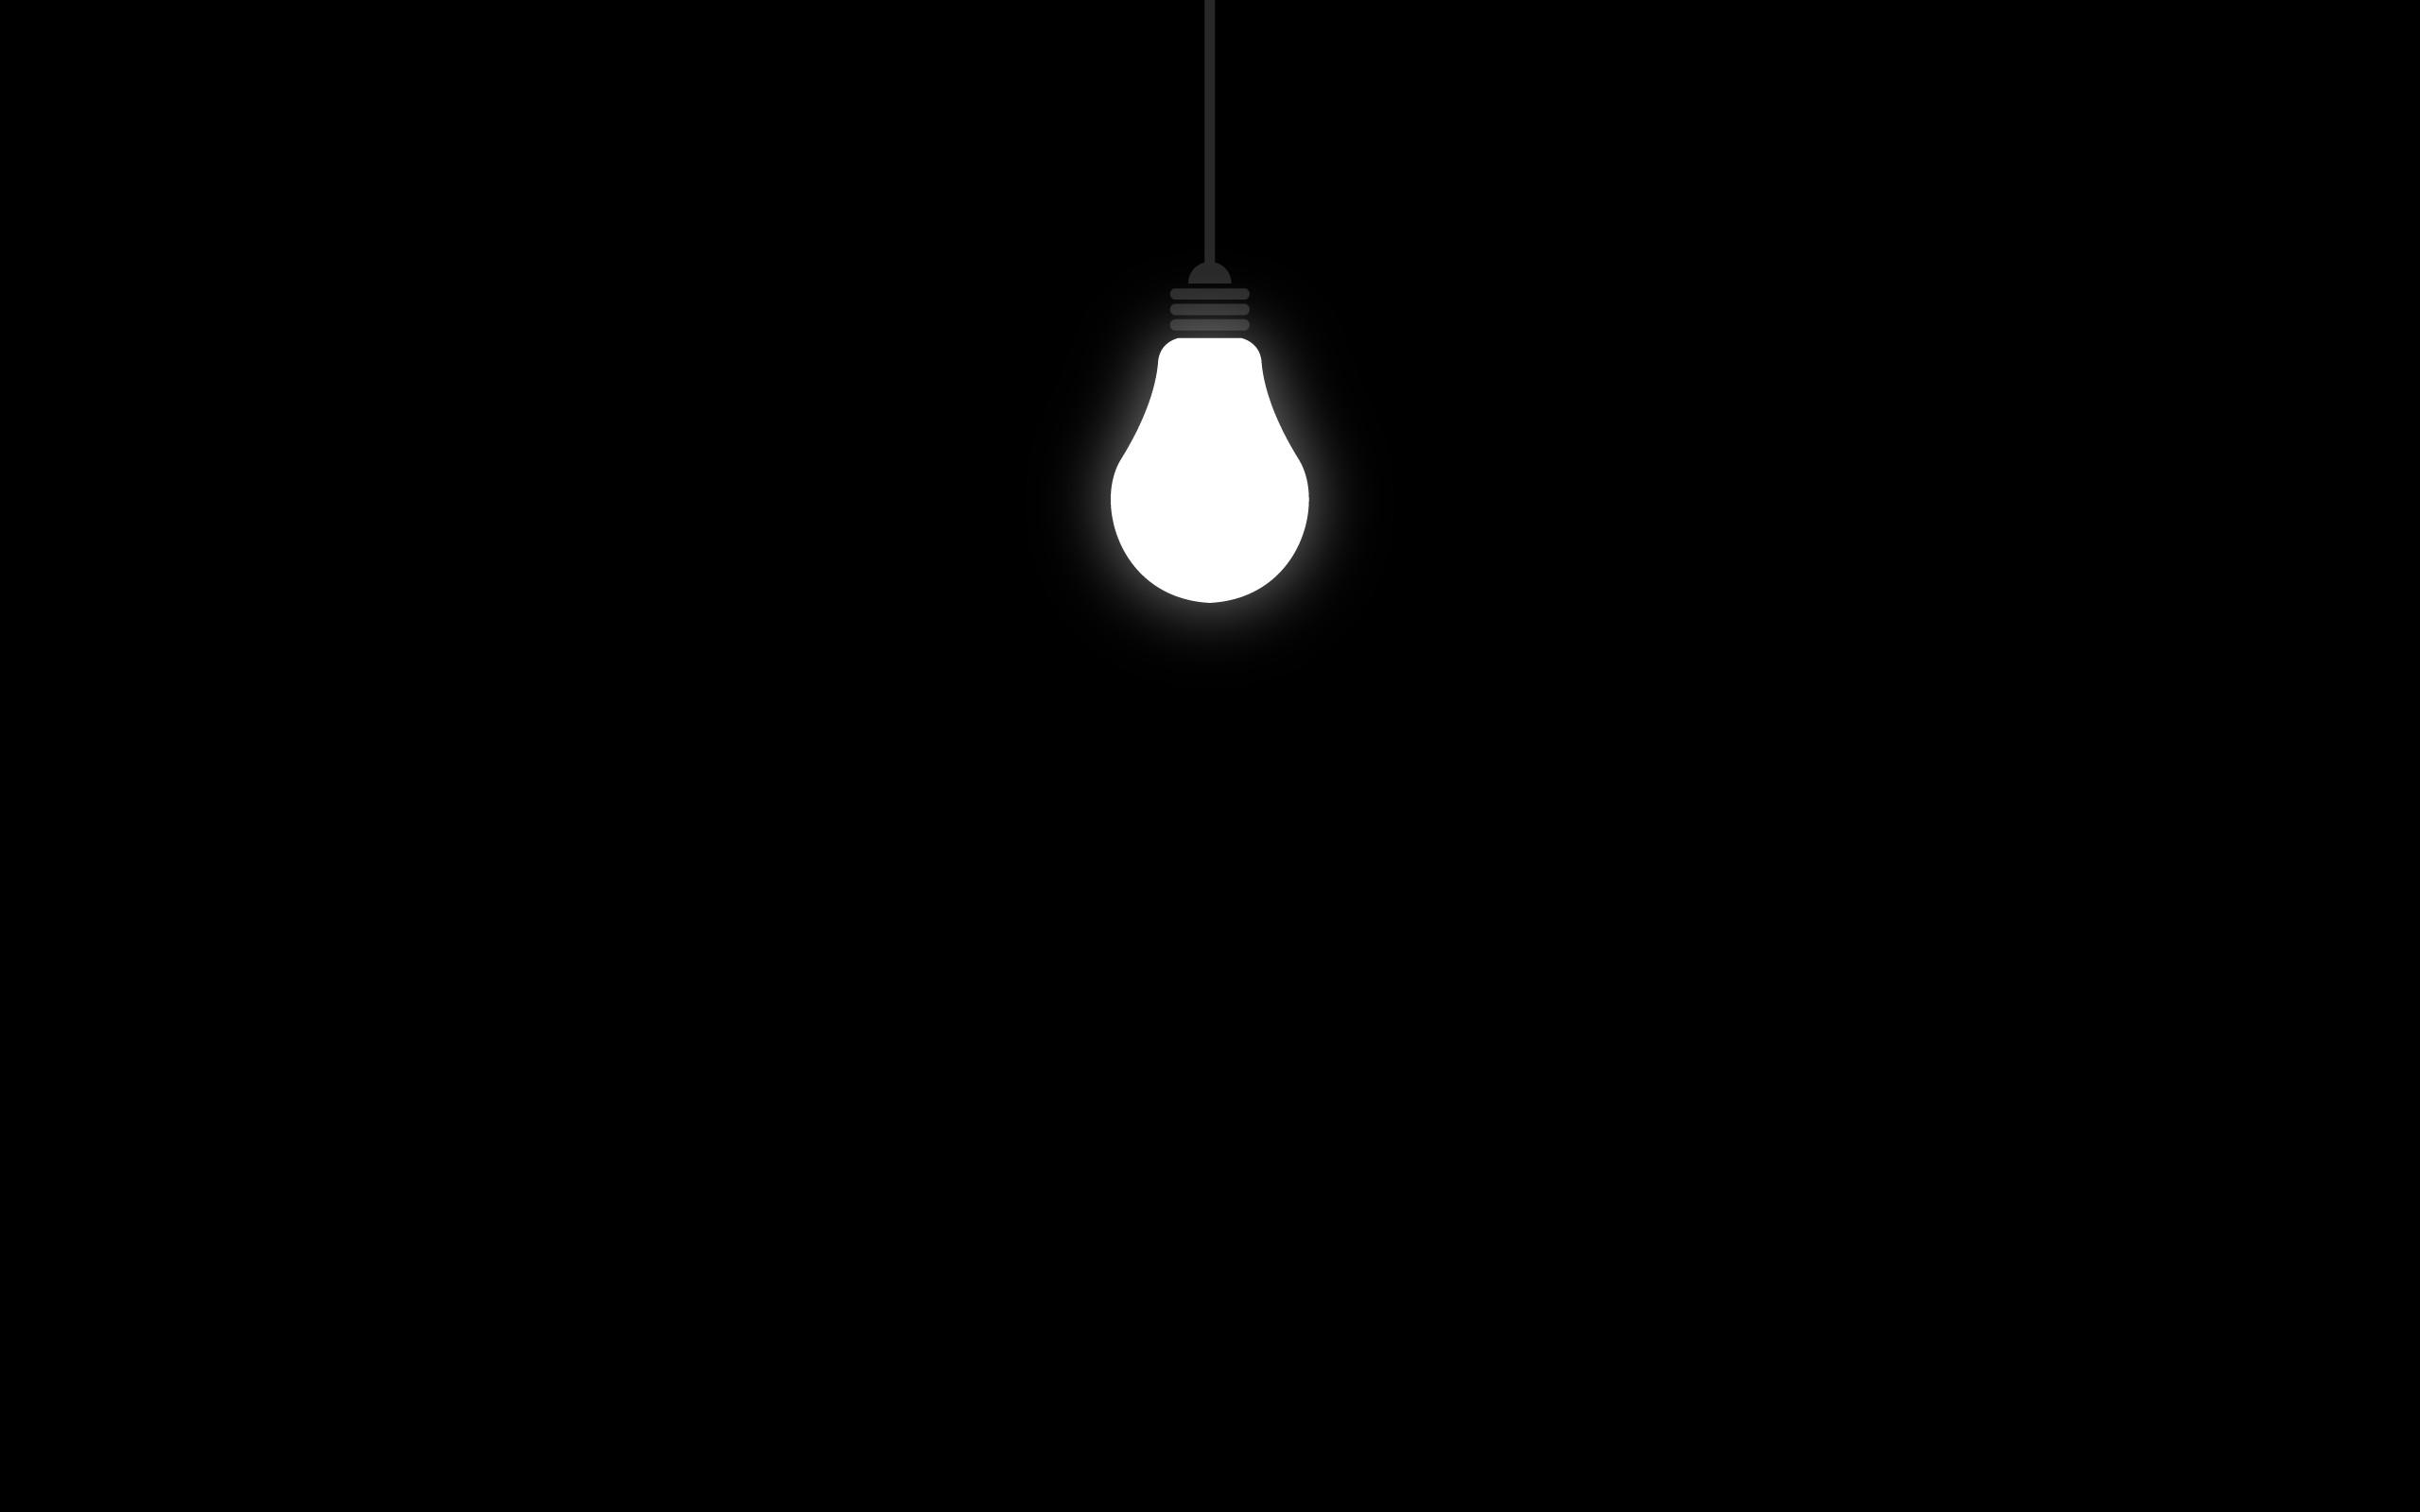 Lonely Light bulb